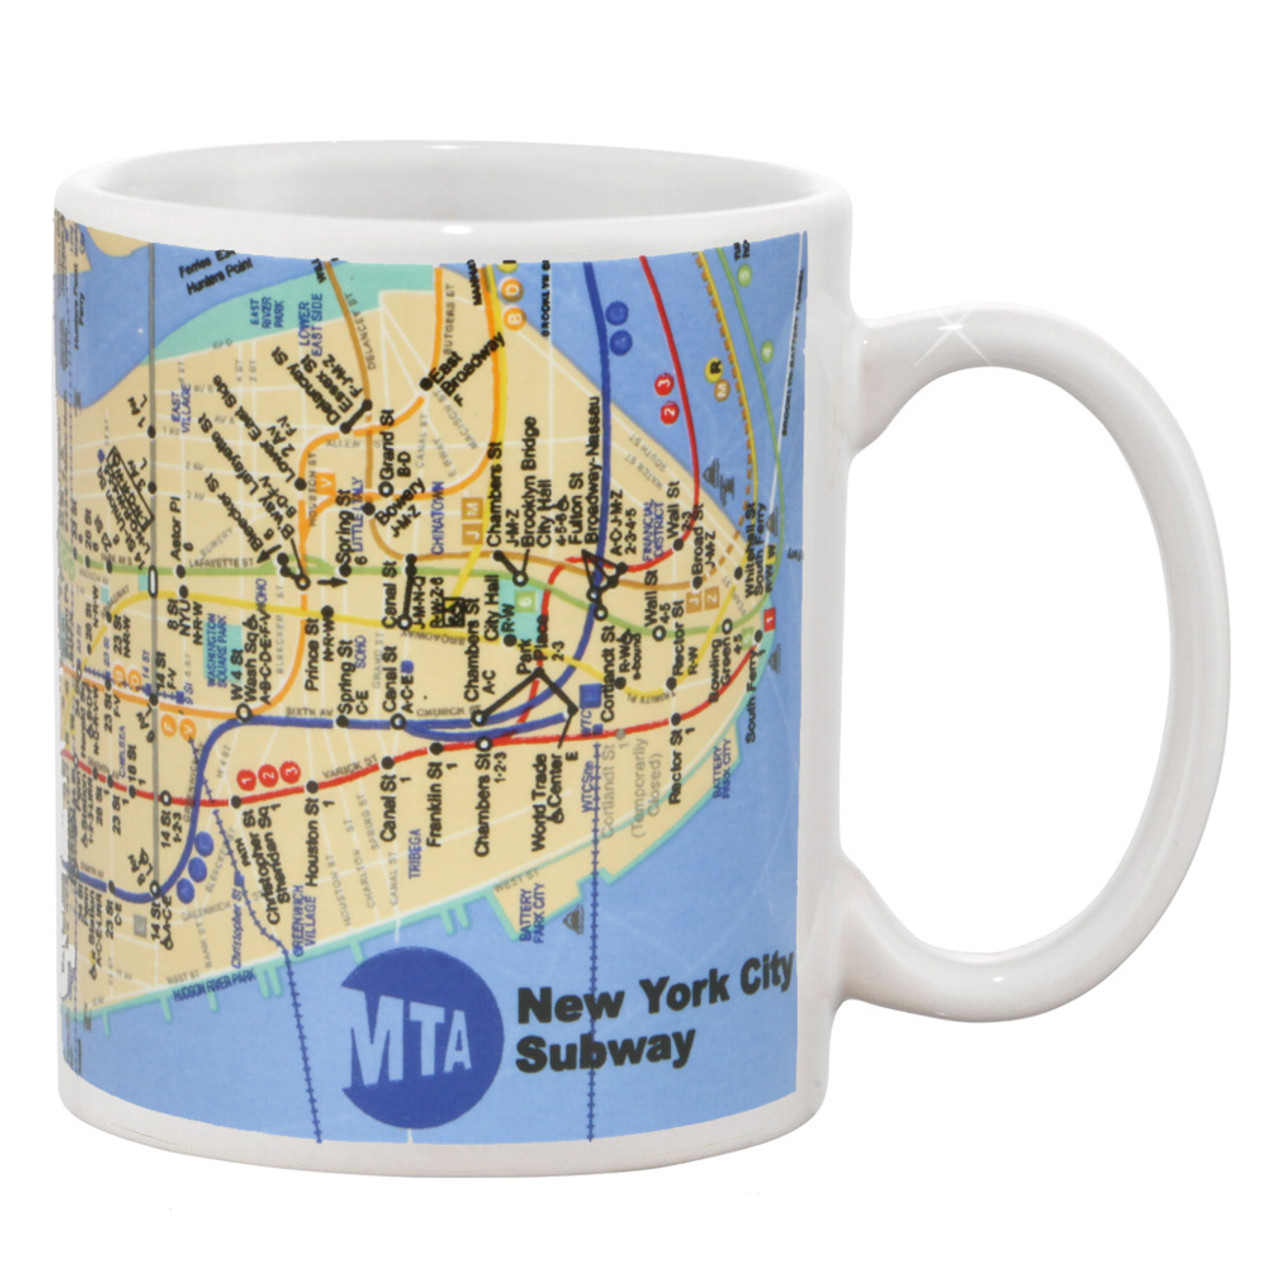 How To Order A Nyc Subway Map Mailed To Me.New York City Mta Subway Map Mug